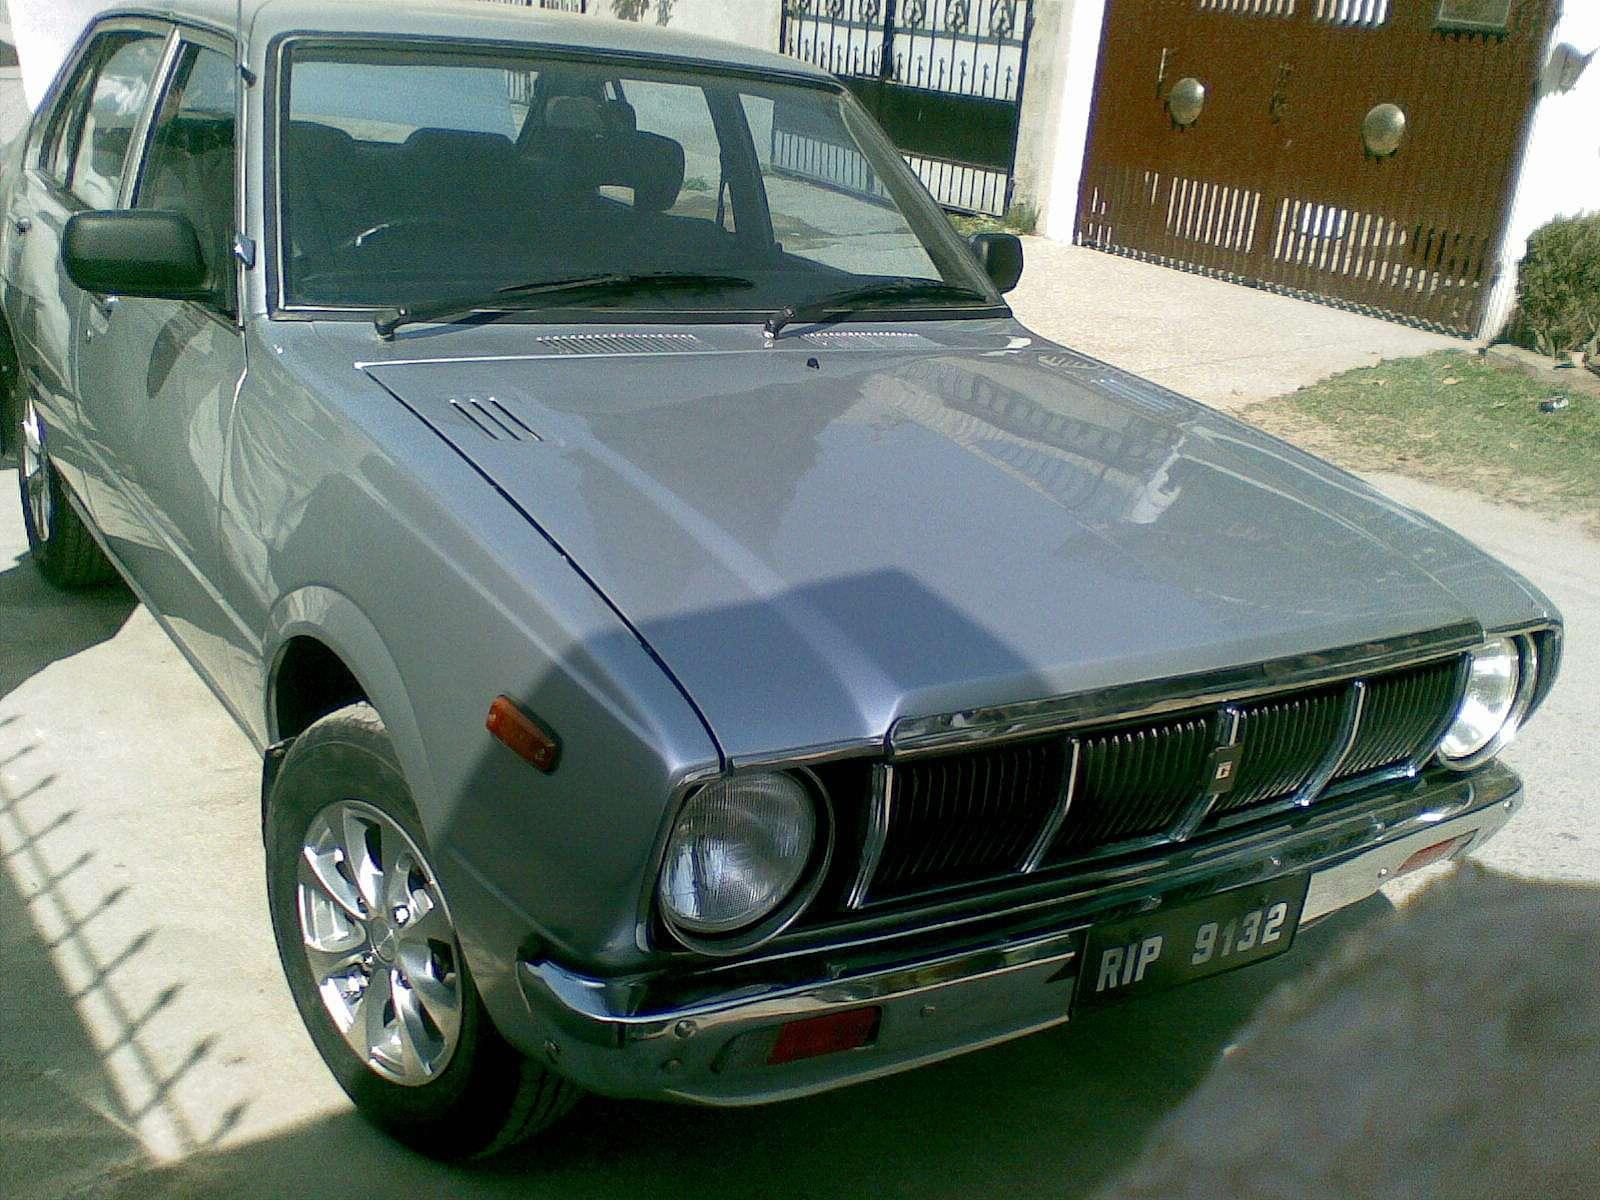 Toyota Corolla 1976 of syumair - Member Ride 9668 | PakWheels